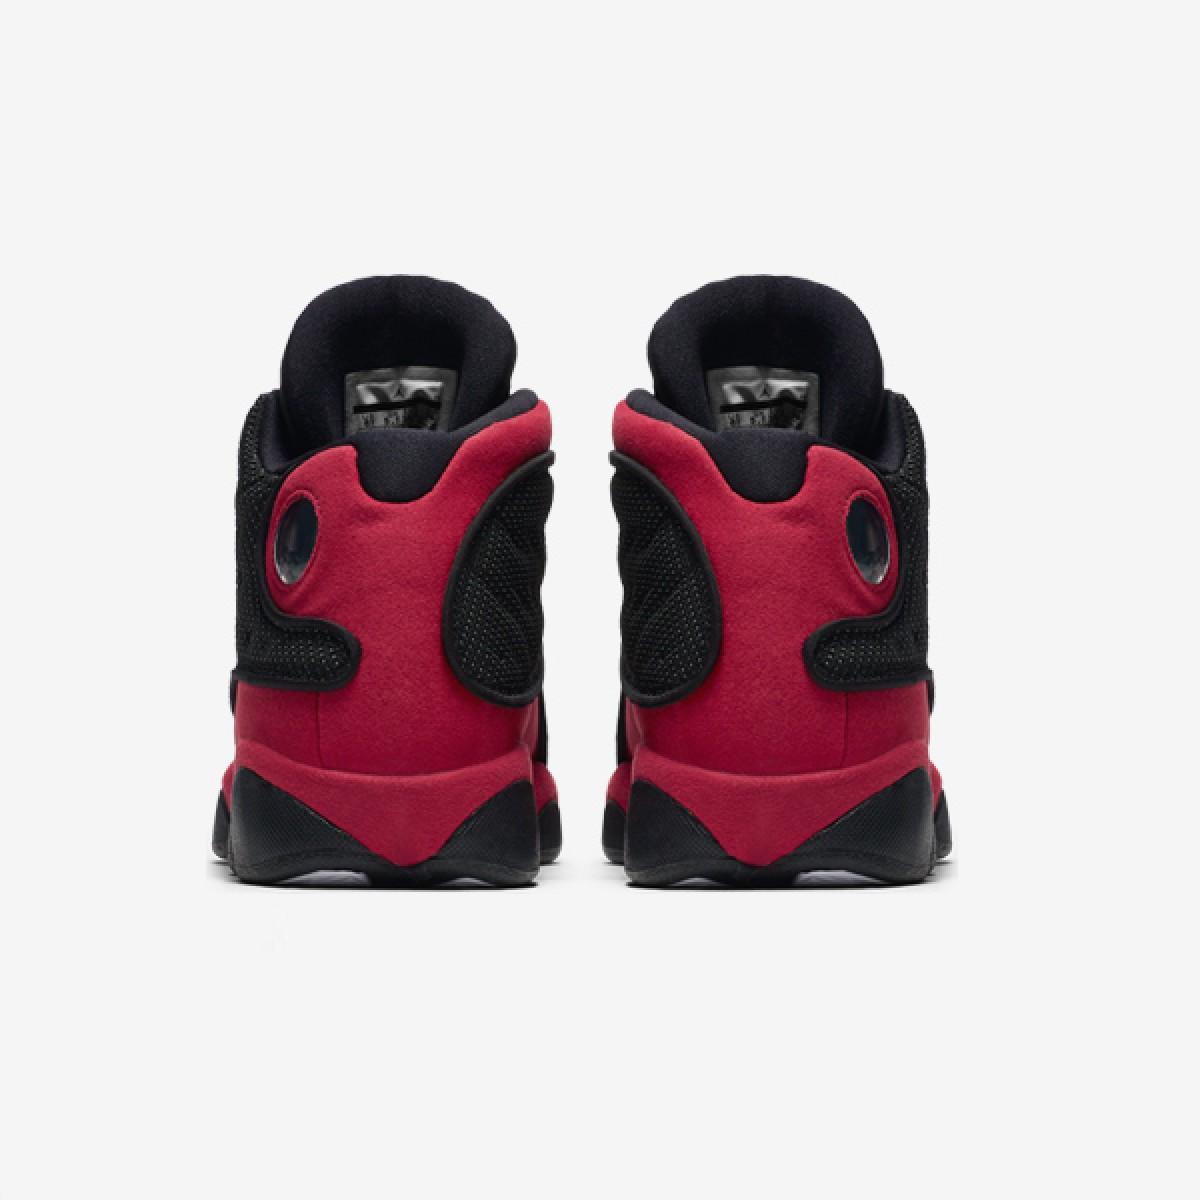 Air Jordan 13 GS 'Bred' 414574-004